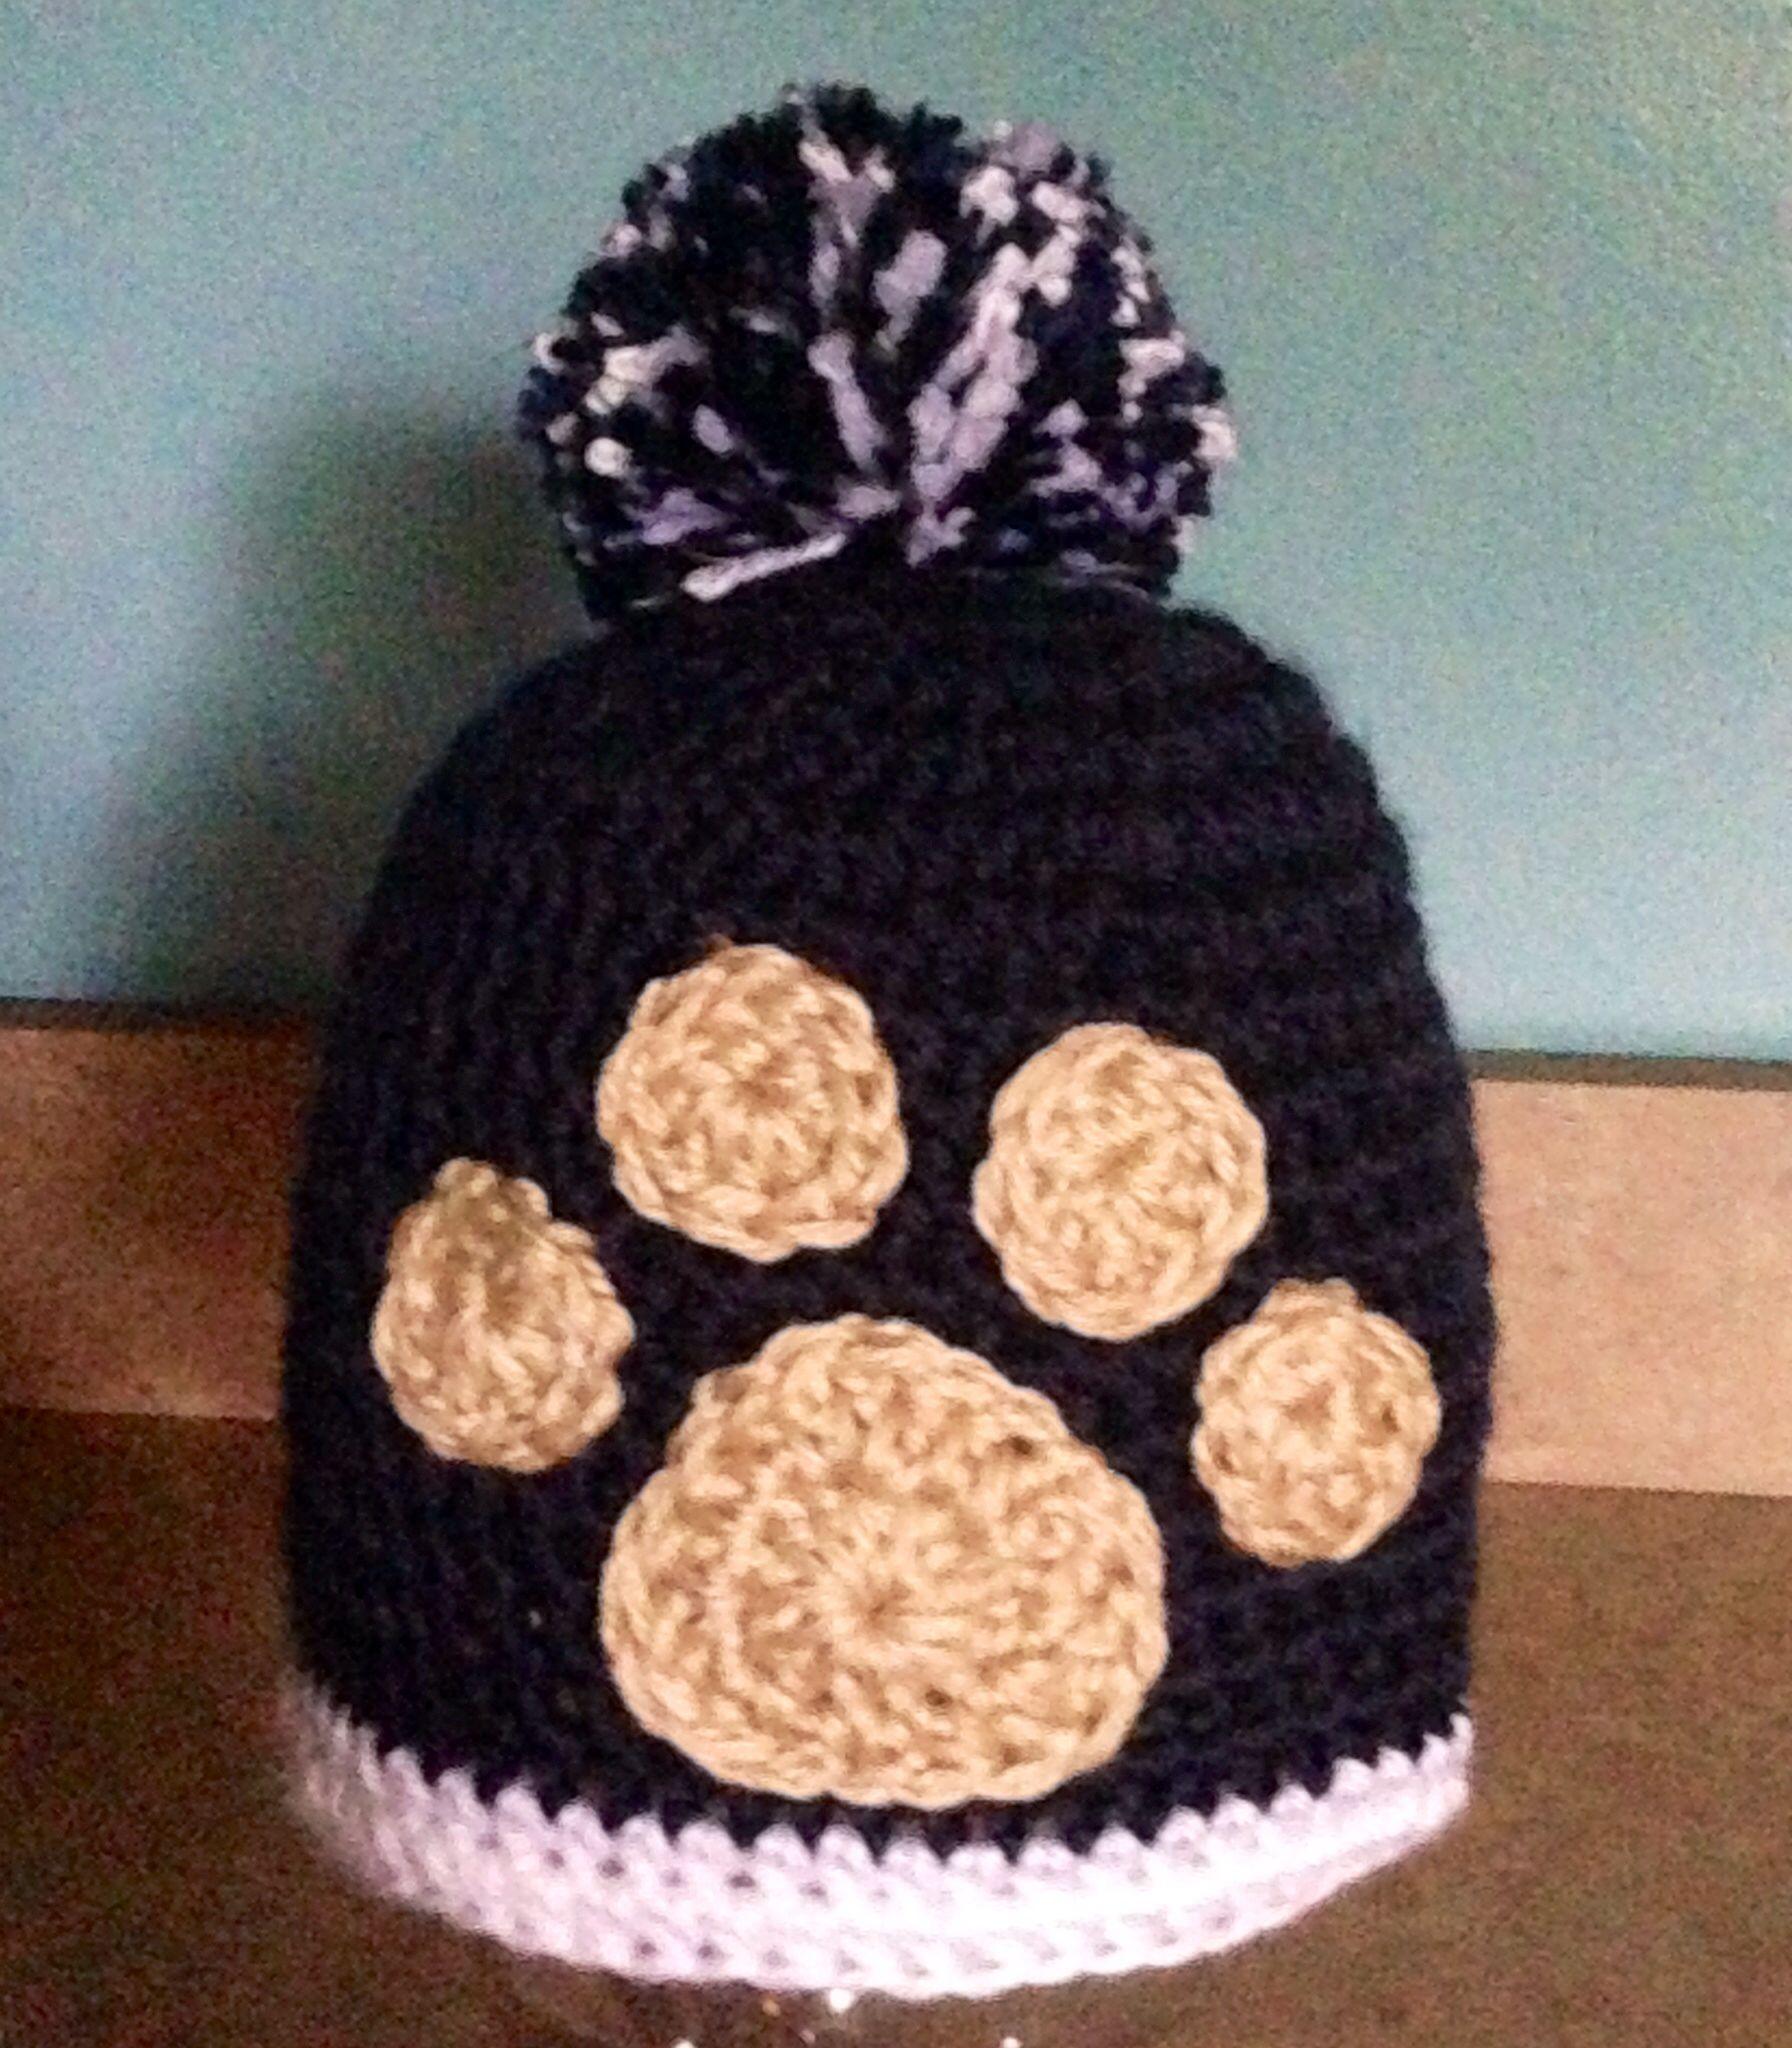 Penn State Paw Print Crocheted Hat Sew Crochet Pinterest Headband Pattern Diagram Hats Caps Etc Pin